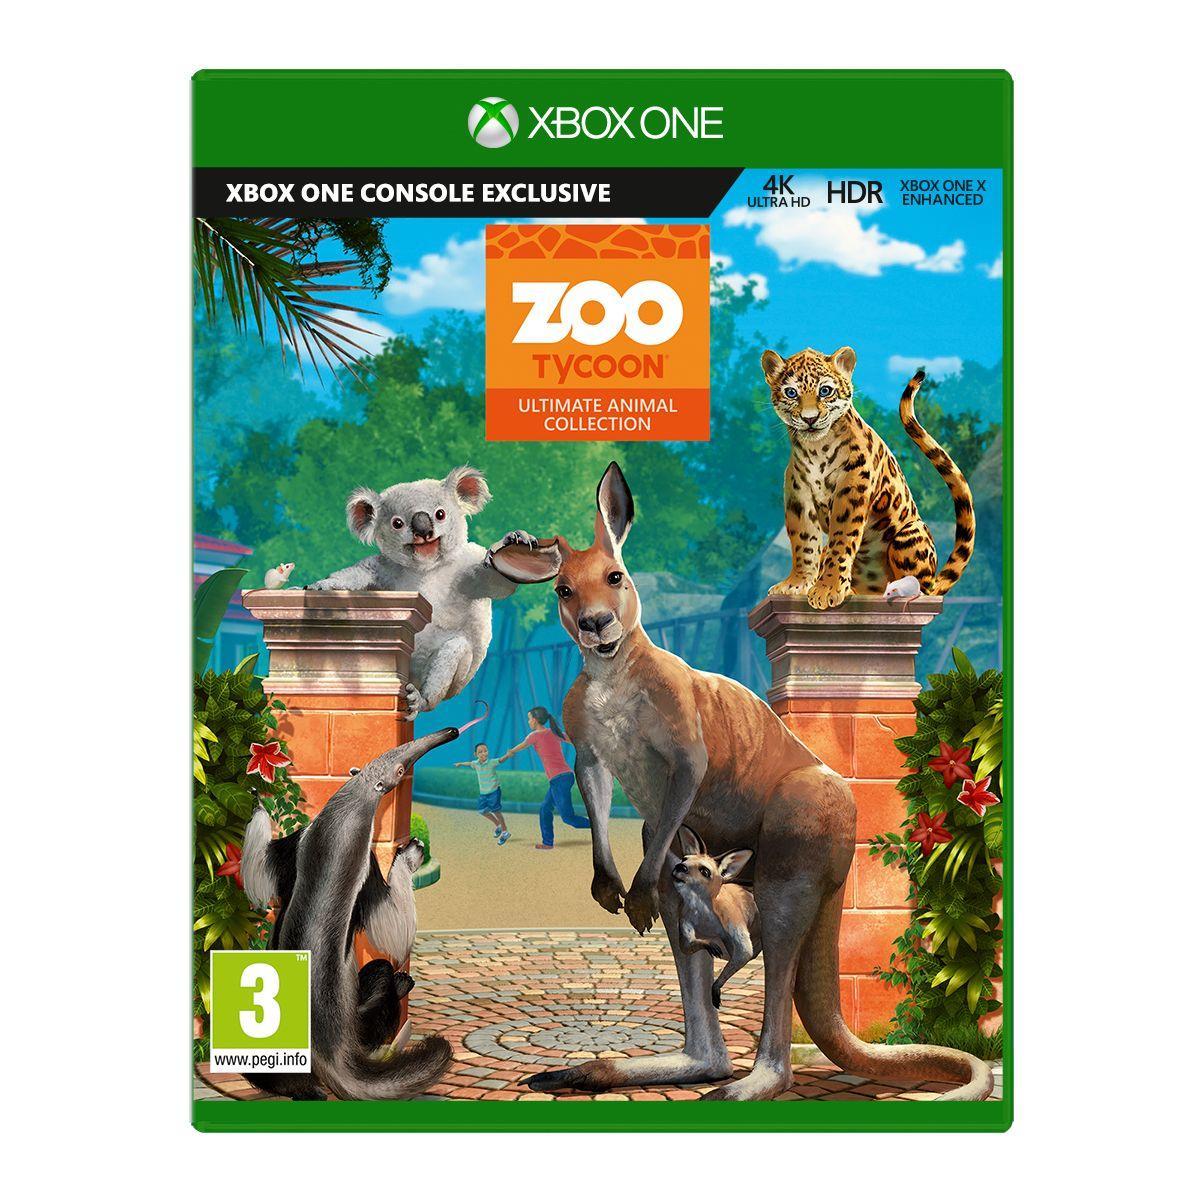 Jeu xbox one microsoft zoo tycoon - 10% de remise imm?diate avec le code : black10